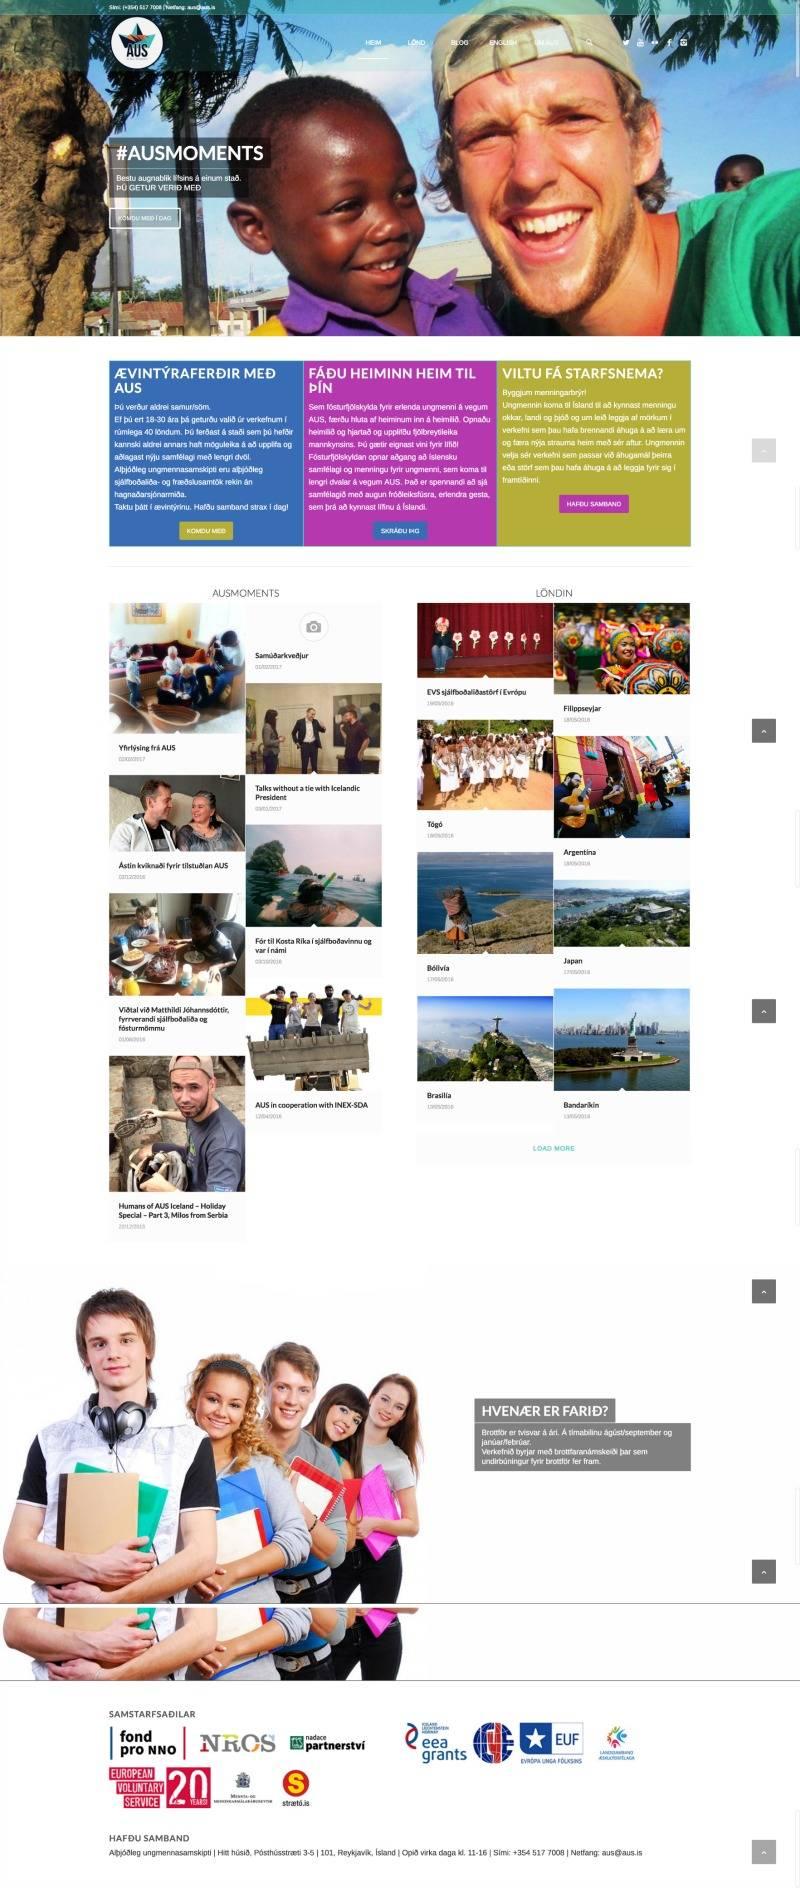 aus.is, produced by webmom.eu